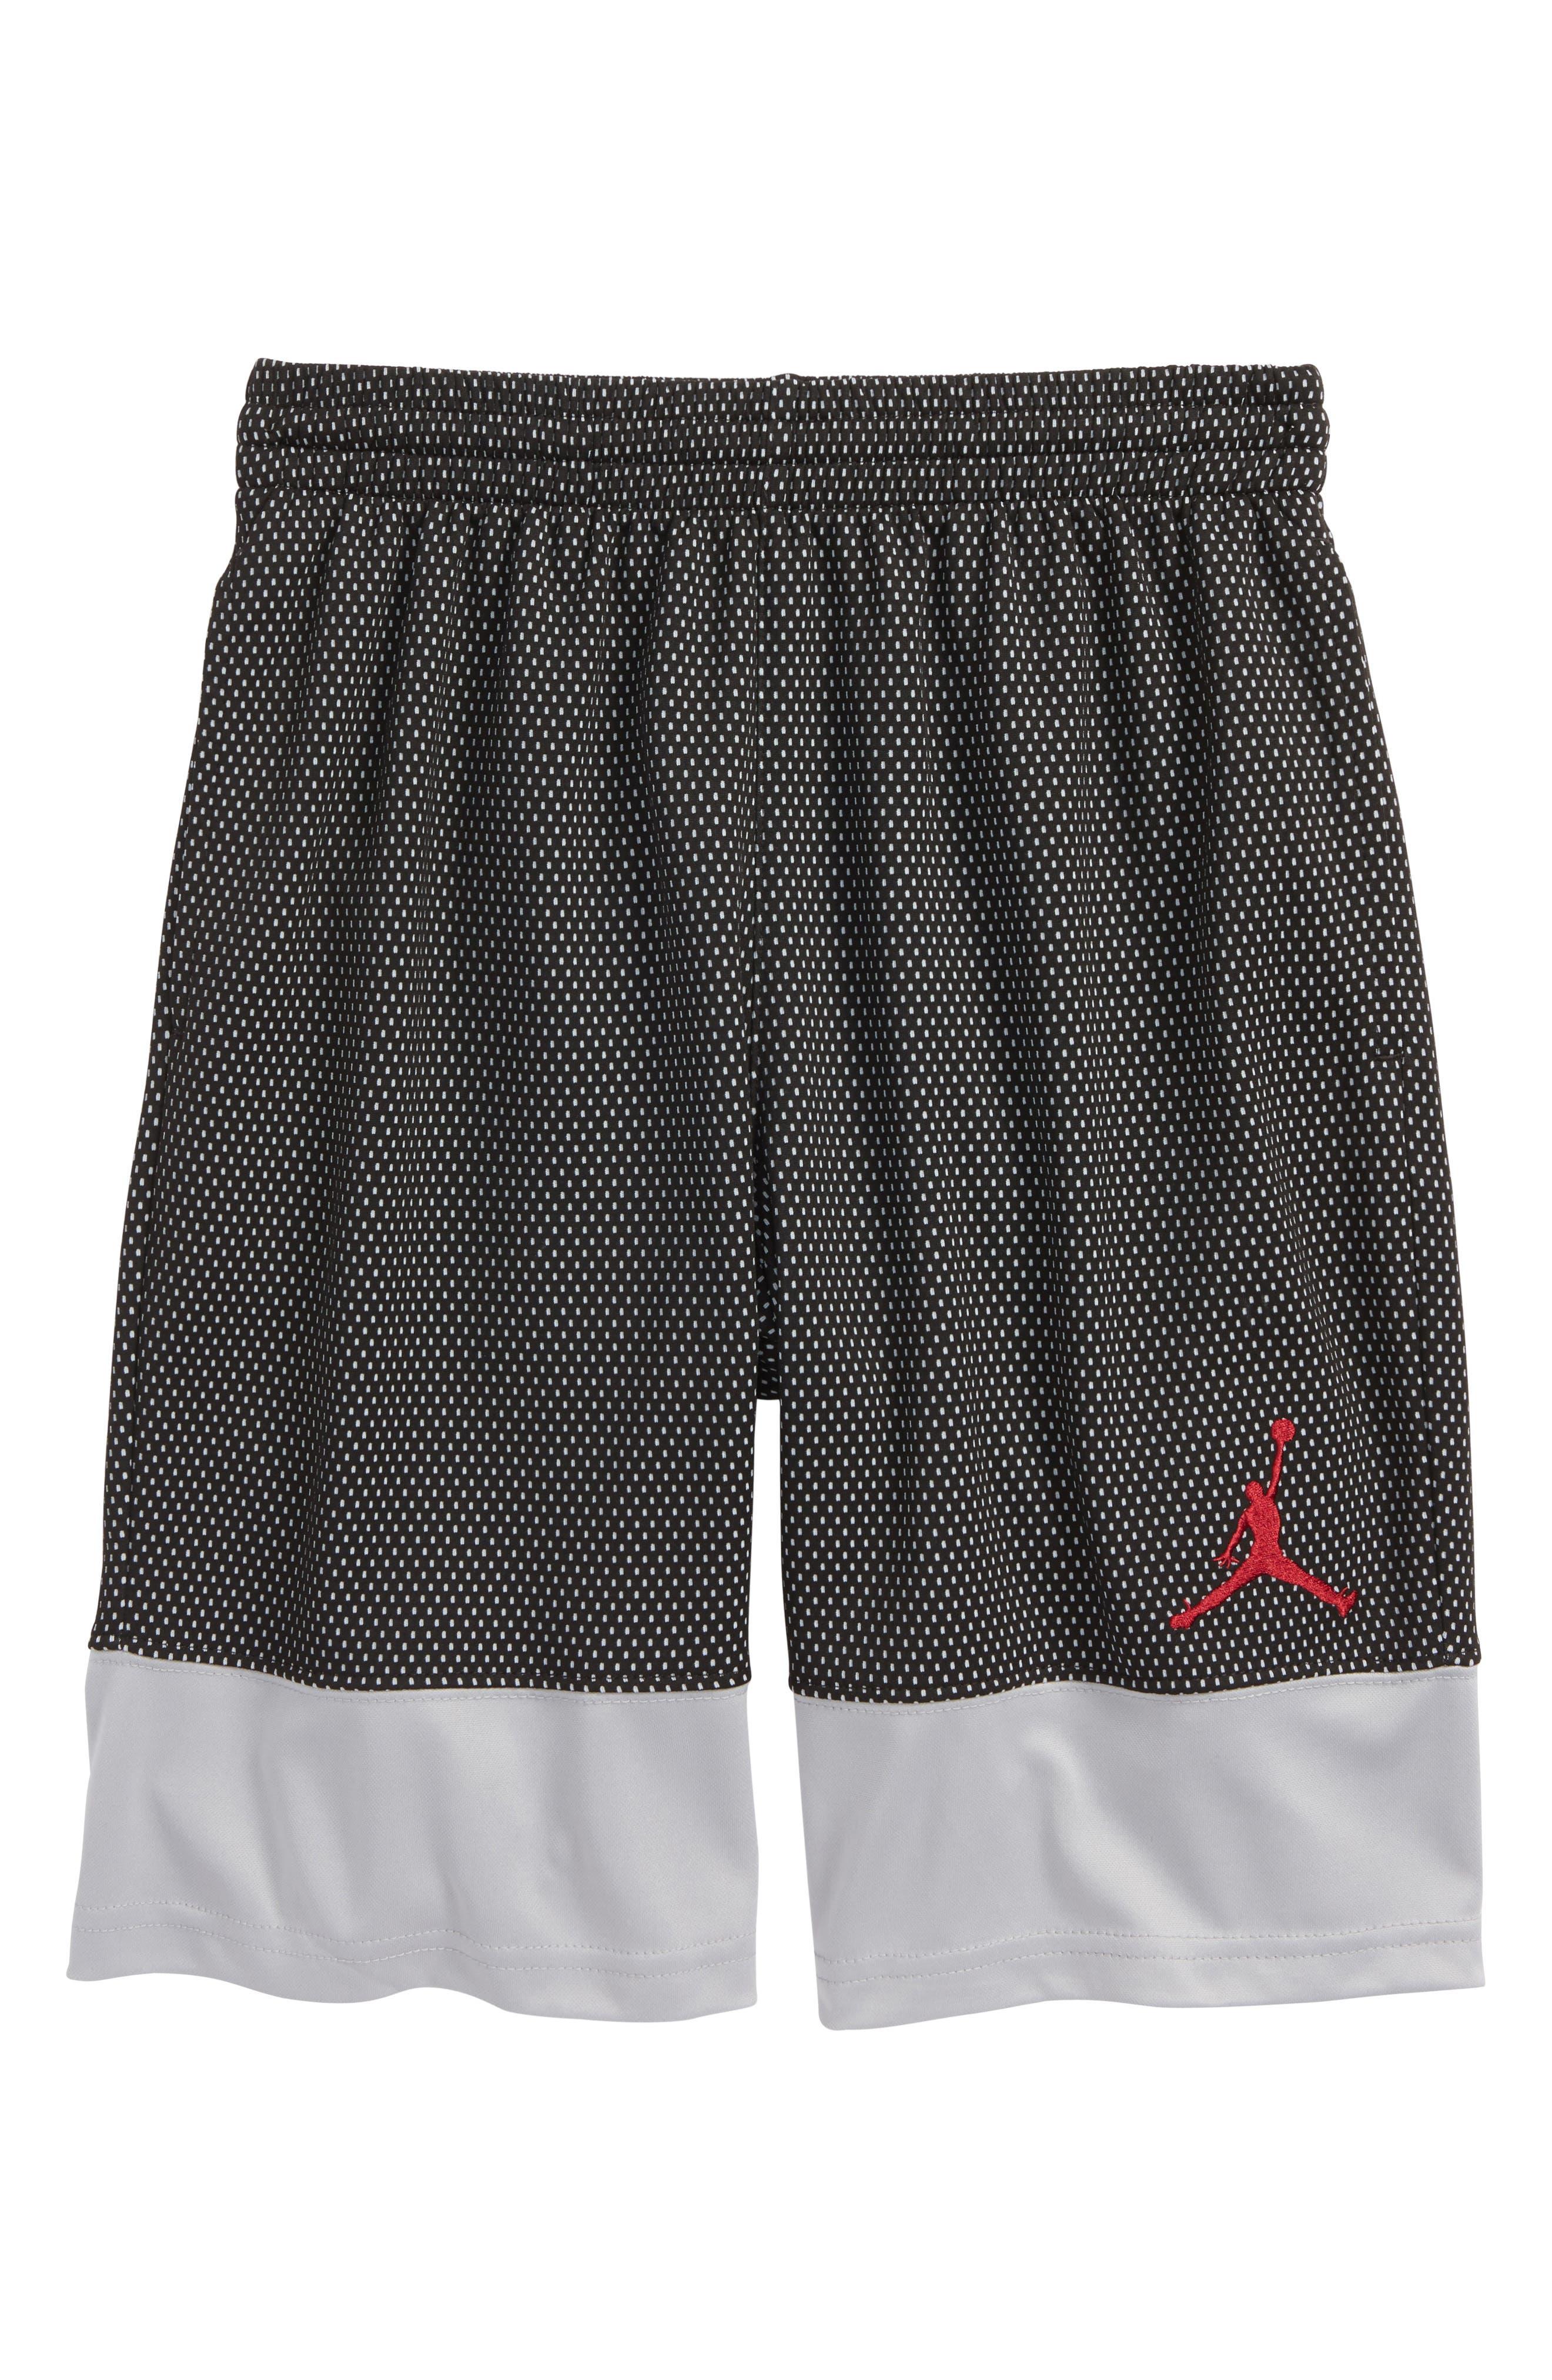 Main Image - Jordan AJ 90s D2 Mesh Shorts (Big Boys)